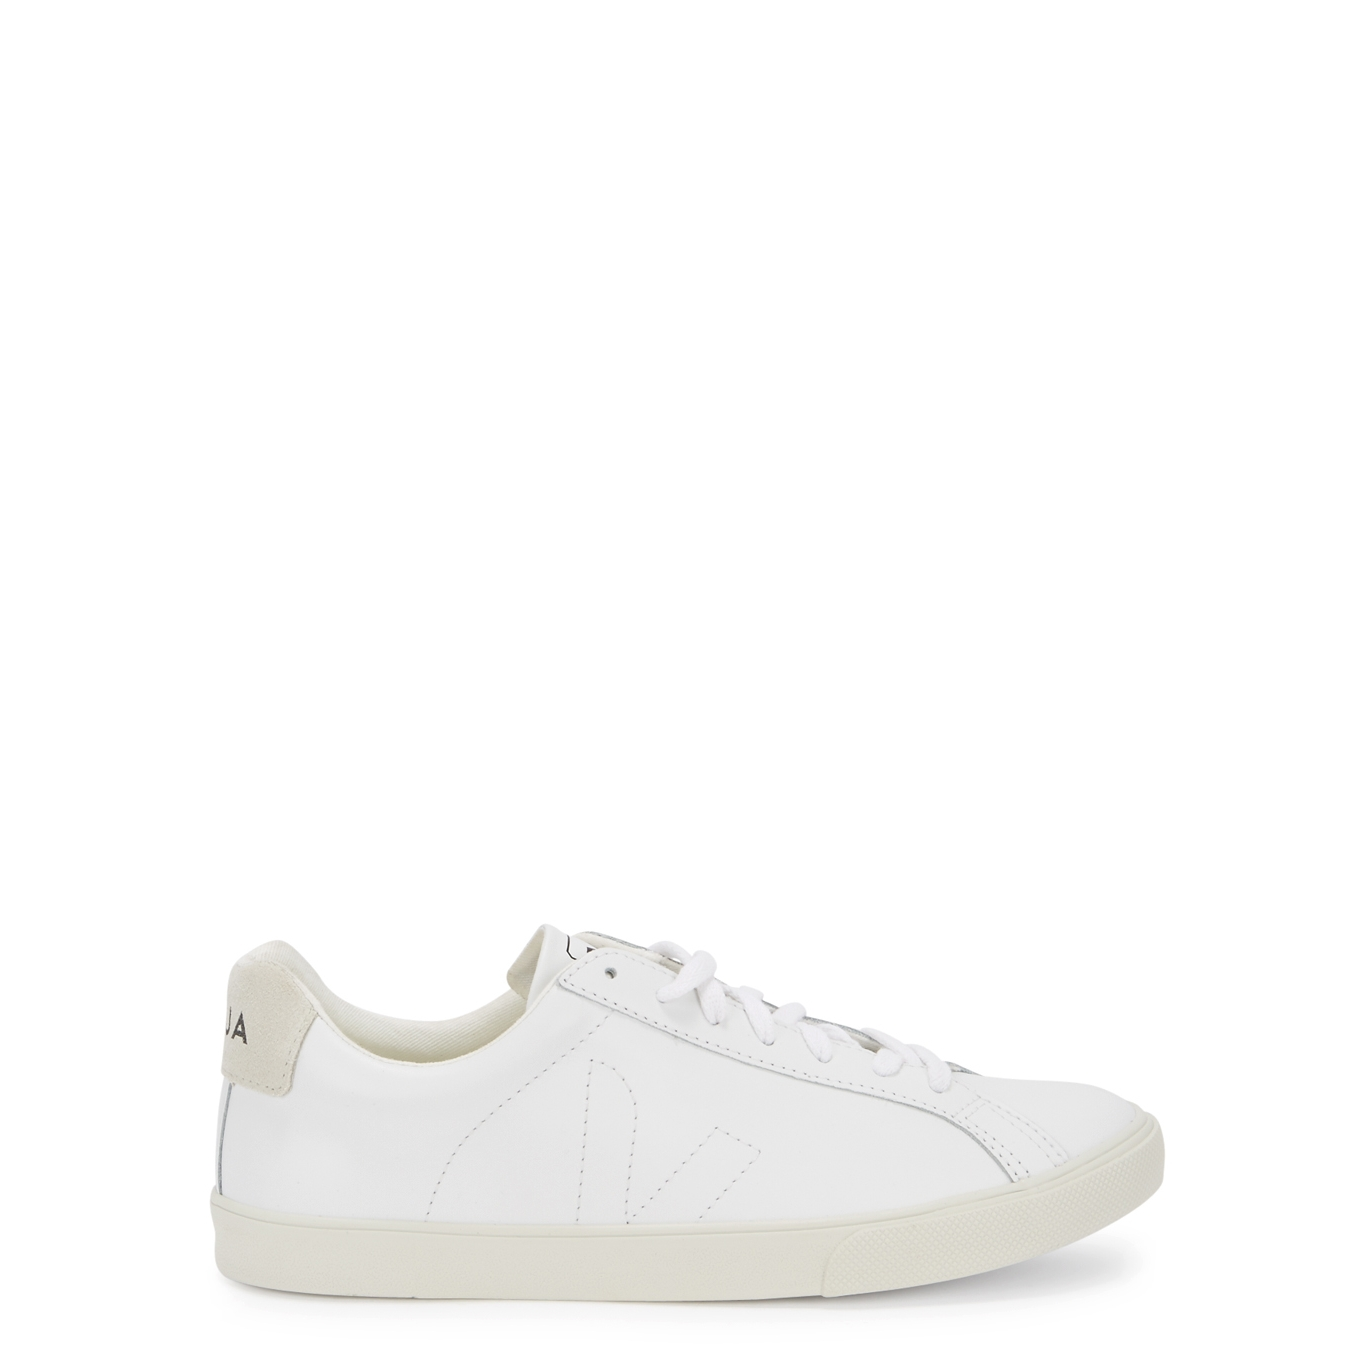 5f7e4d26a59 Esplar white leather trainers